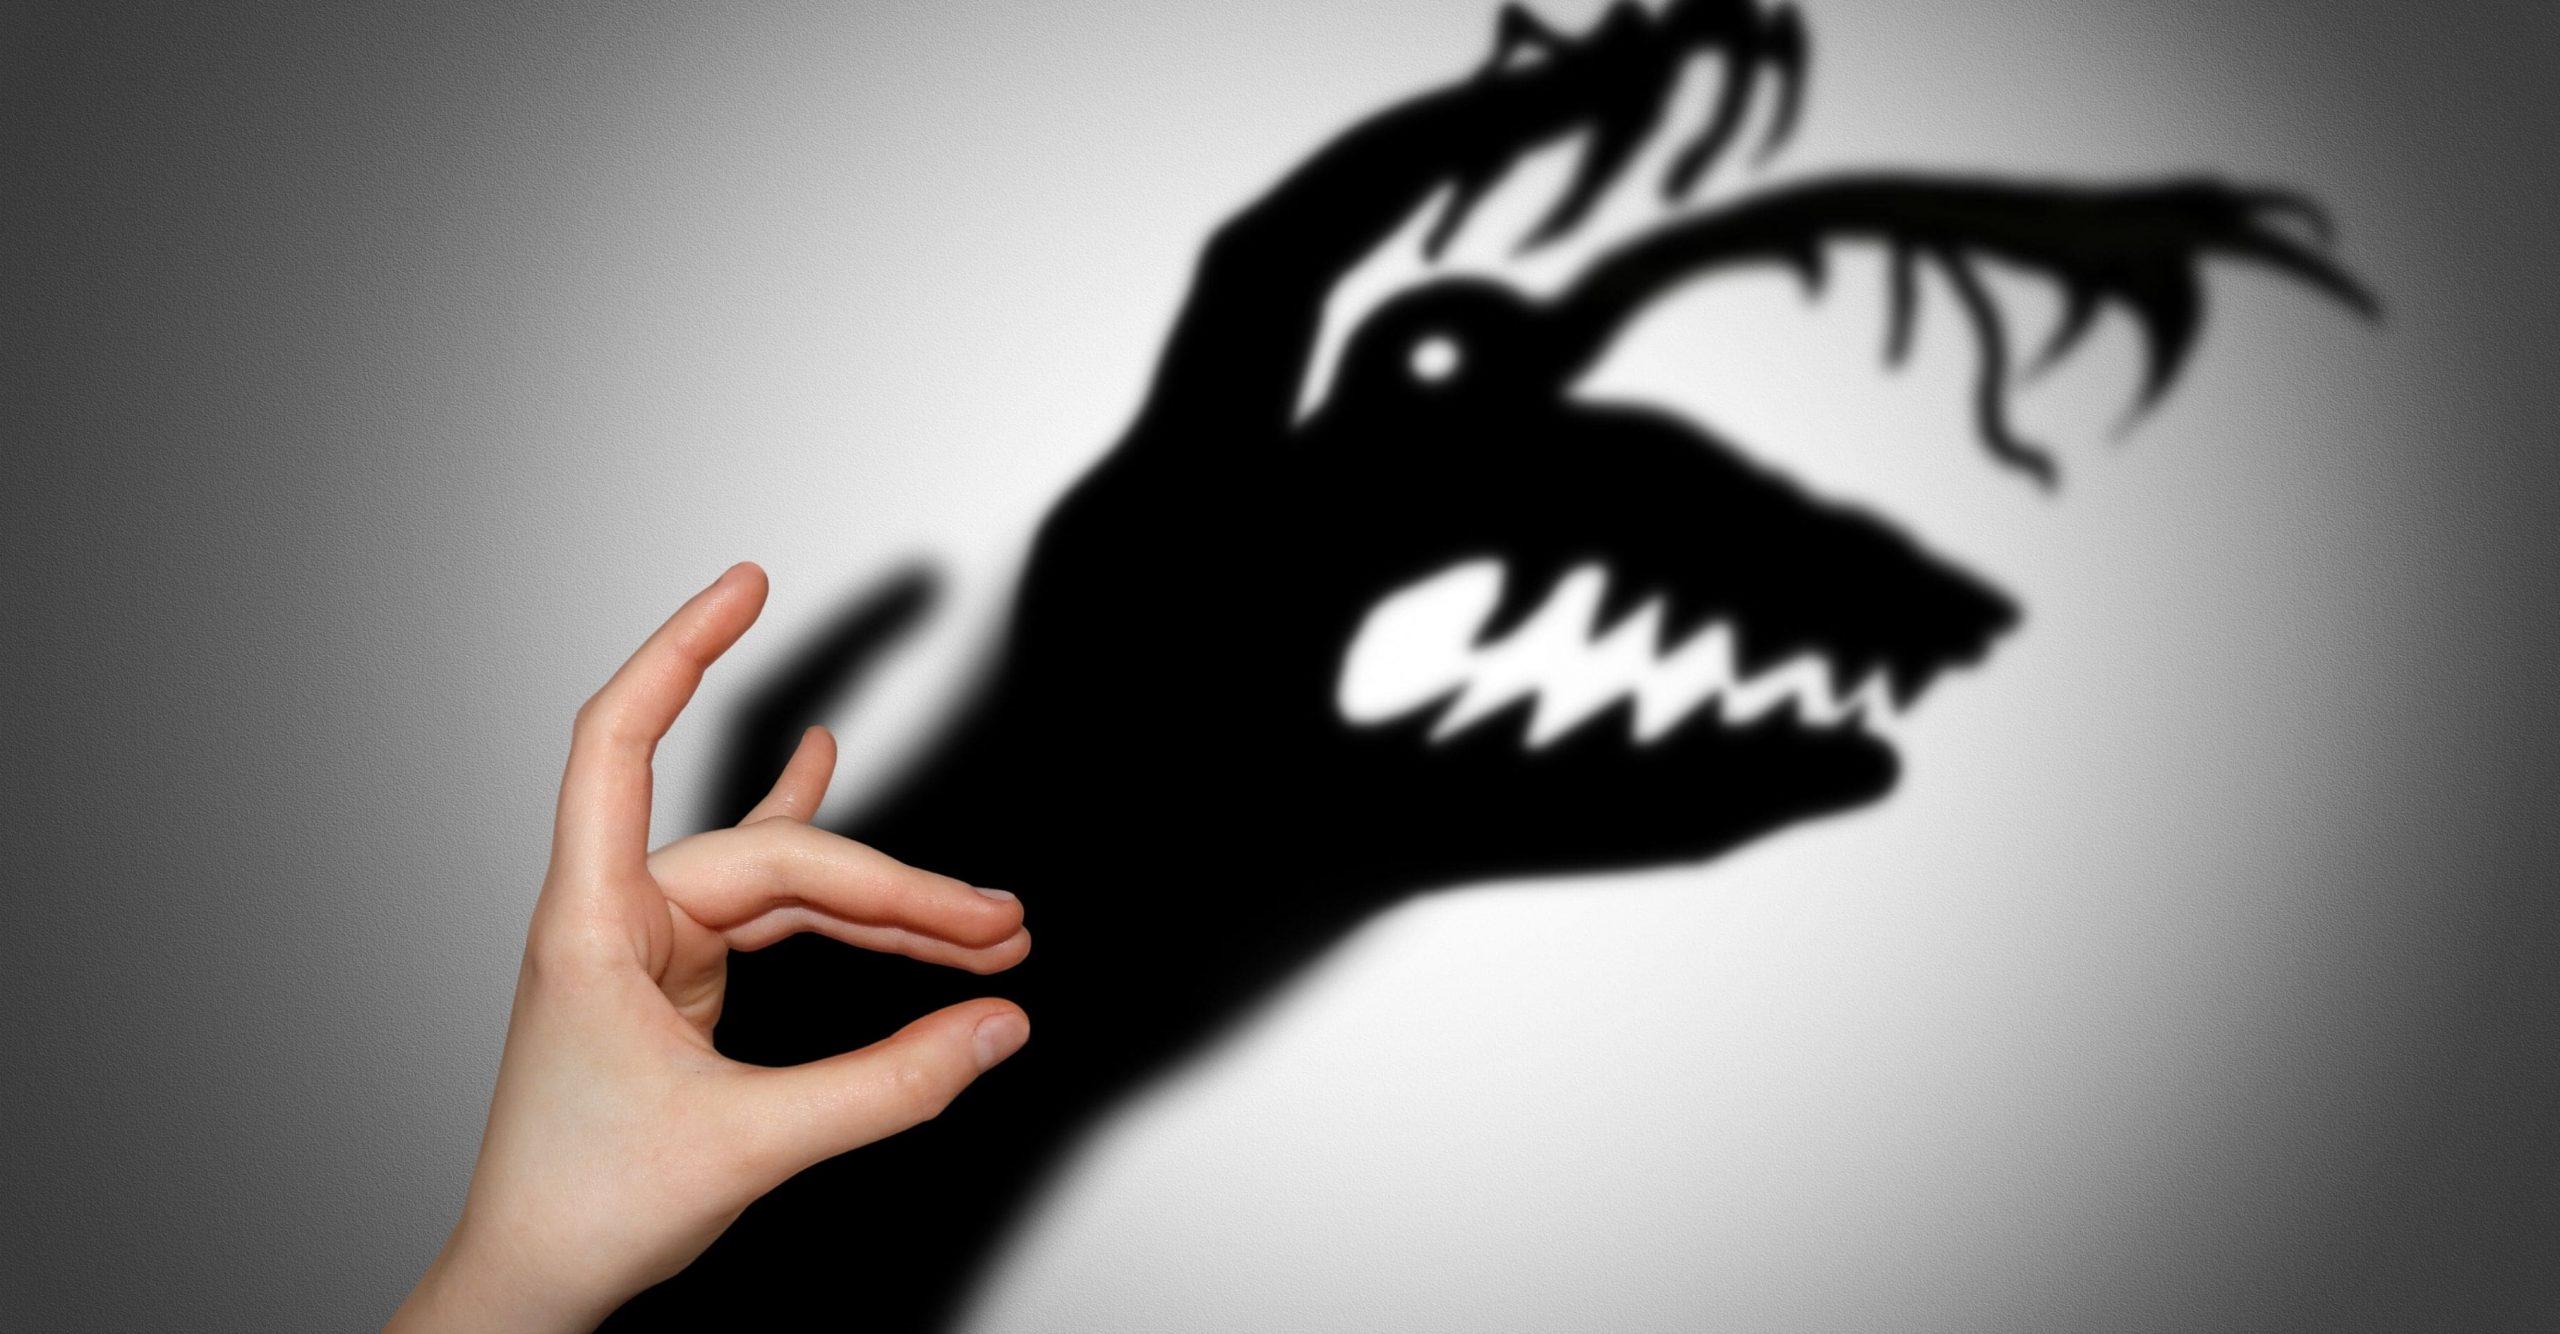 Hoe kan je angstige kinderen helpen?